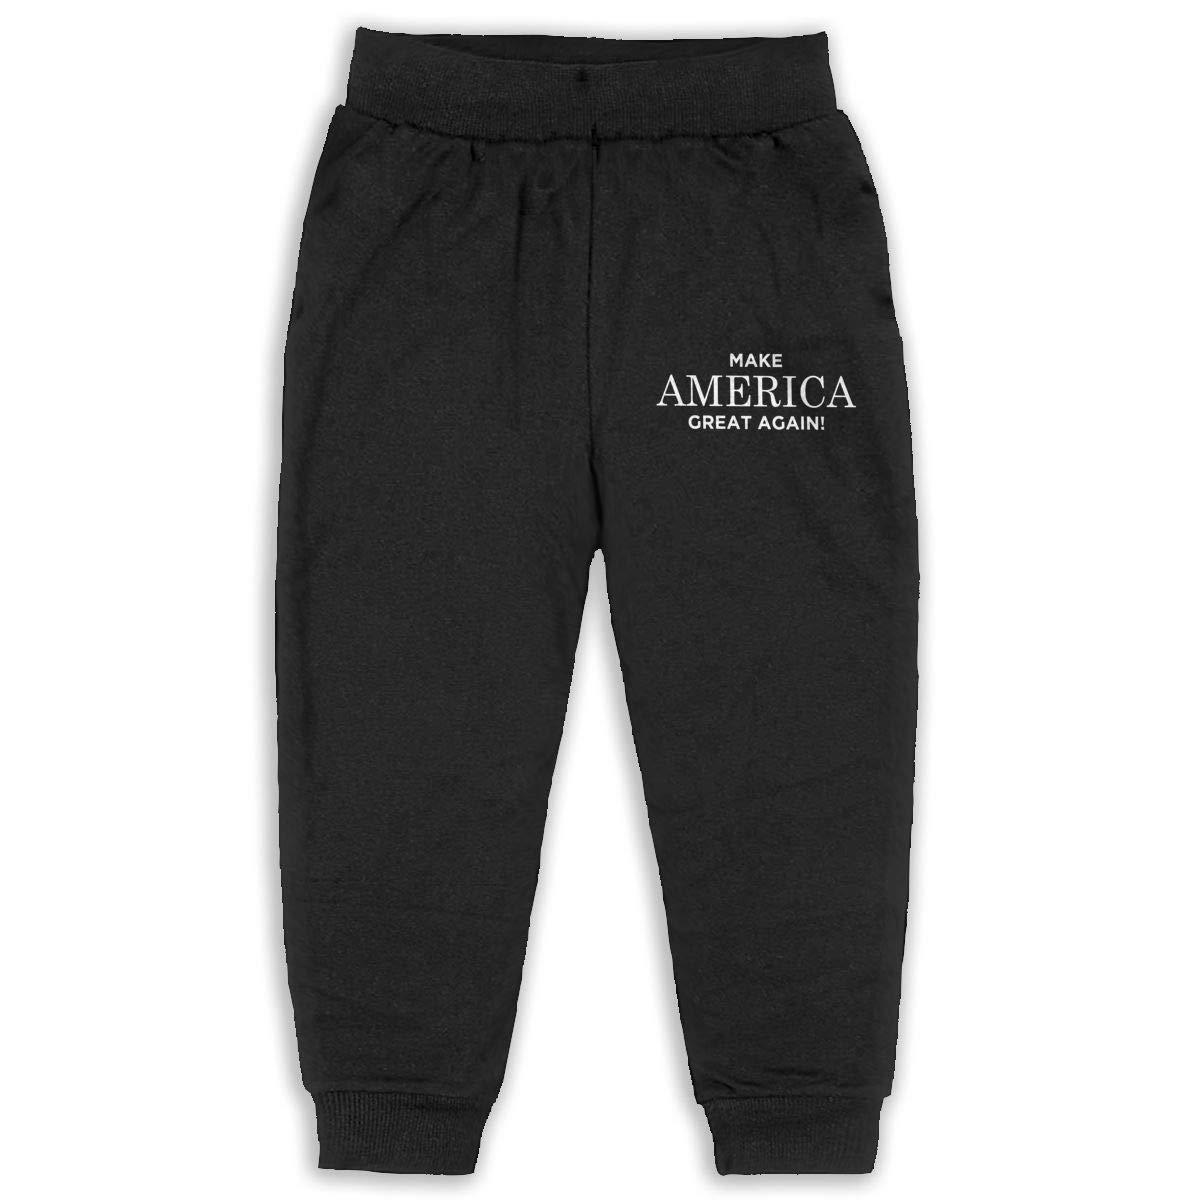 LFCLOSET Make America Great Again Children Active Jogger Sweatpants Basic Elastic Sport Pants Black